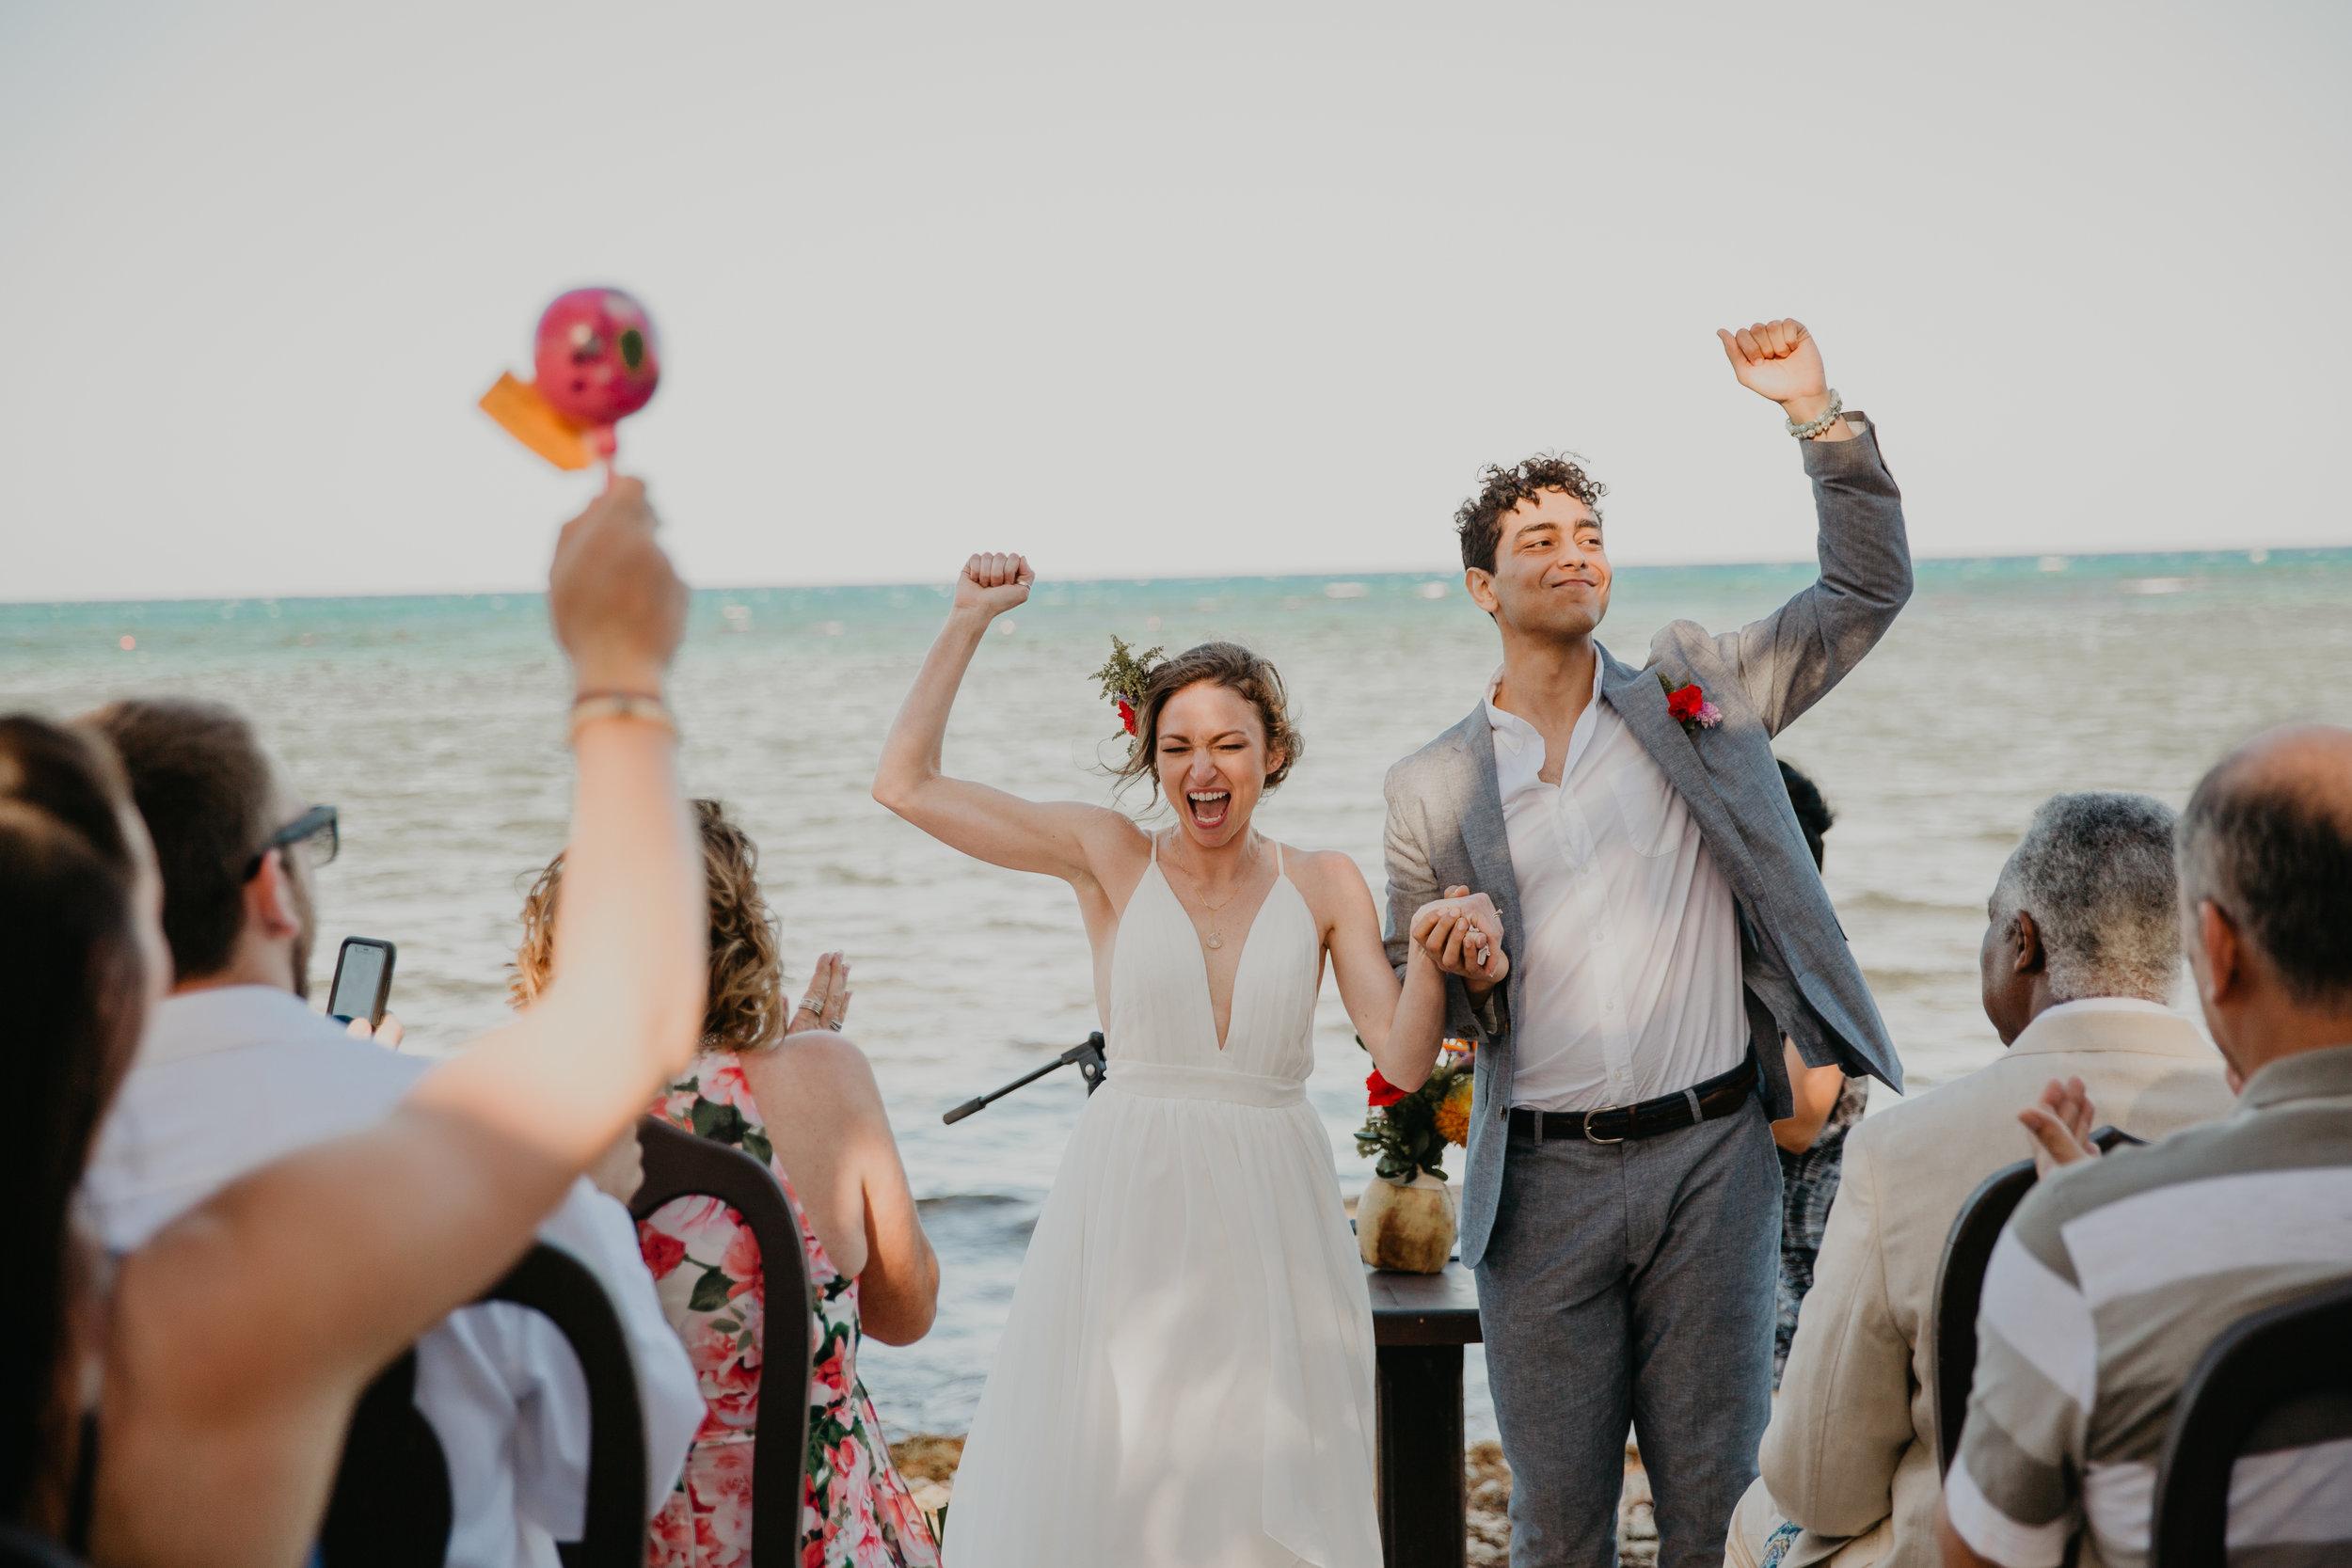 Nicole-Daacke-Photography-beachfront-akumal-destionation-wedding-tulum-mexico-elopement-photographer-destination-wedding-inspiration-sunset-champagne-pop-boho-bride-ocean-tropical-bohemian-tulum-wedding-photos-170.jpg